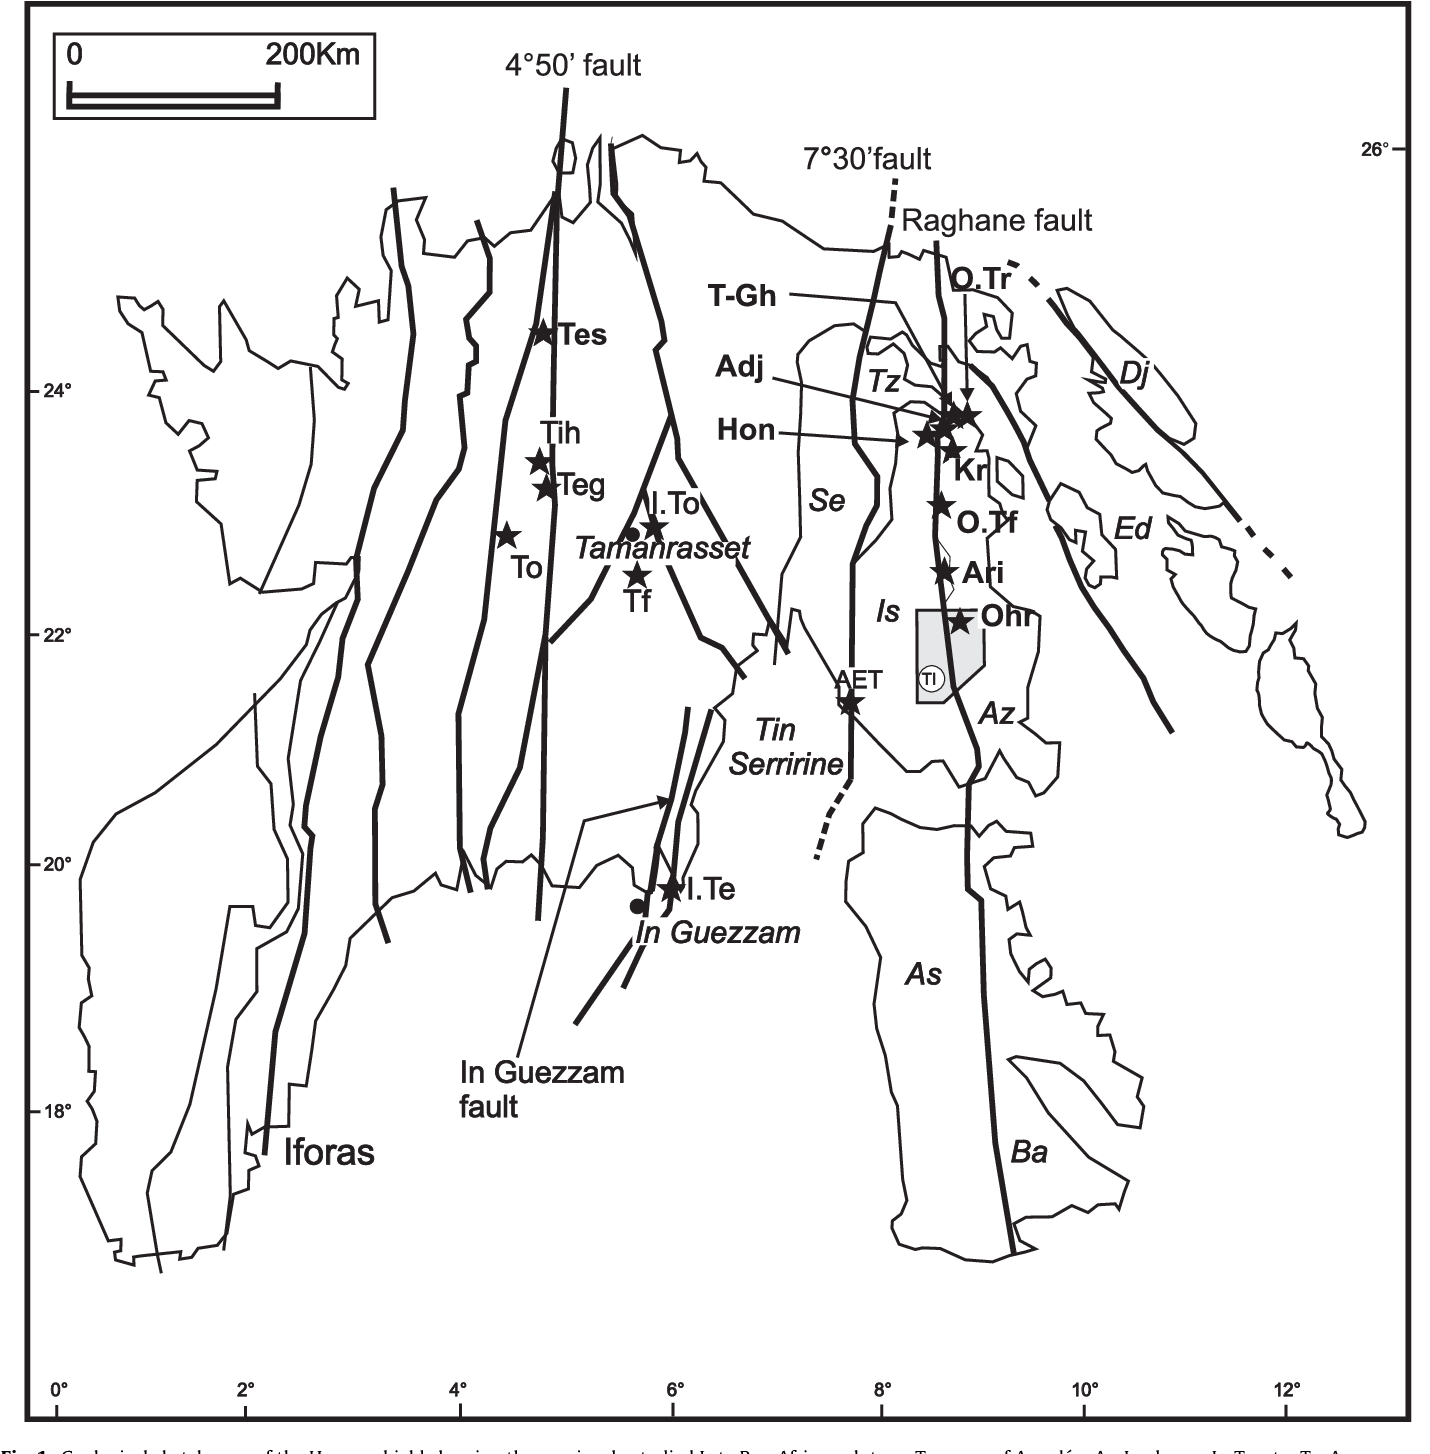 Eburnean and Pan-African granitoids and the Raghane mega-shear zone